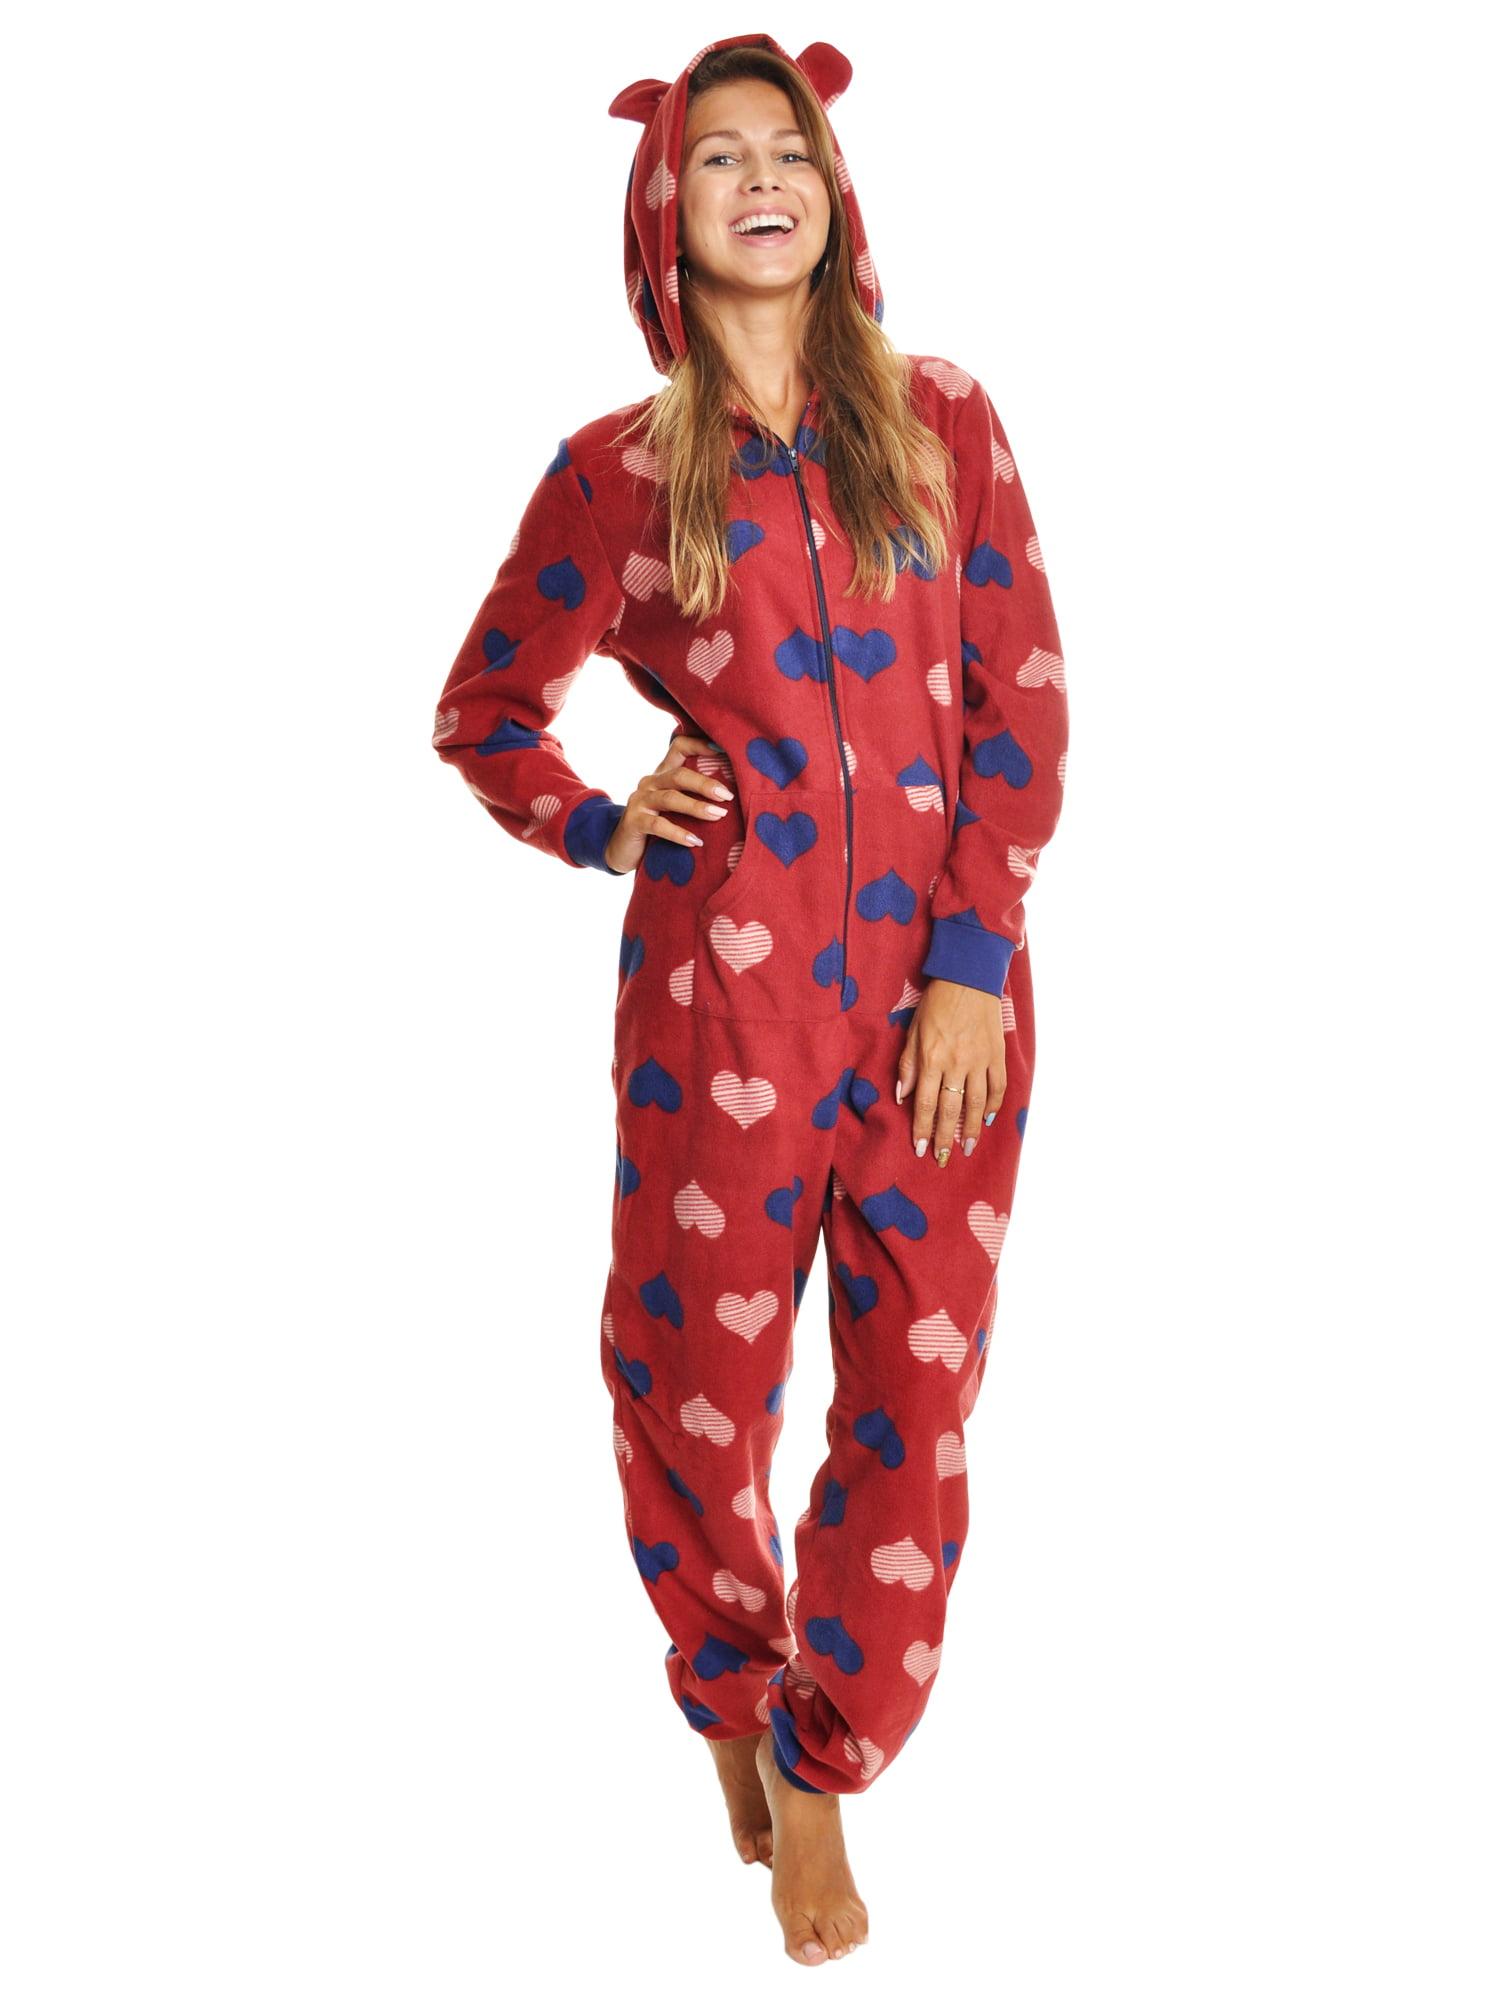 a82d1f0aef Angelina Women s FLEECE Novelty One-Piece Hooded Pajamas (1-Pack) -  Walmart.com